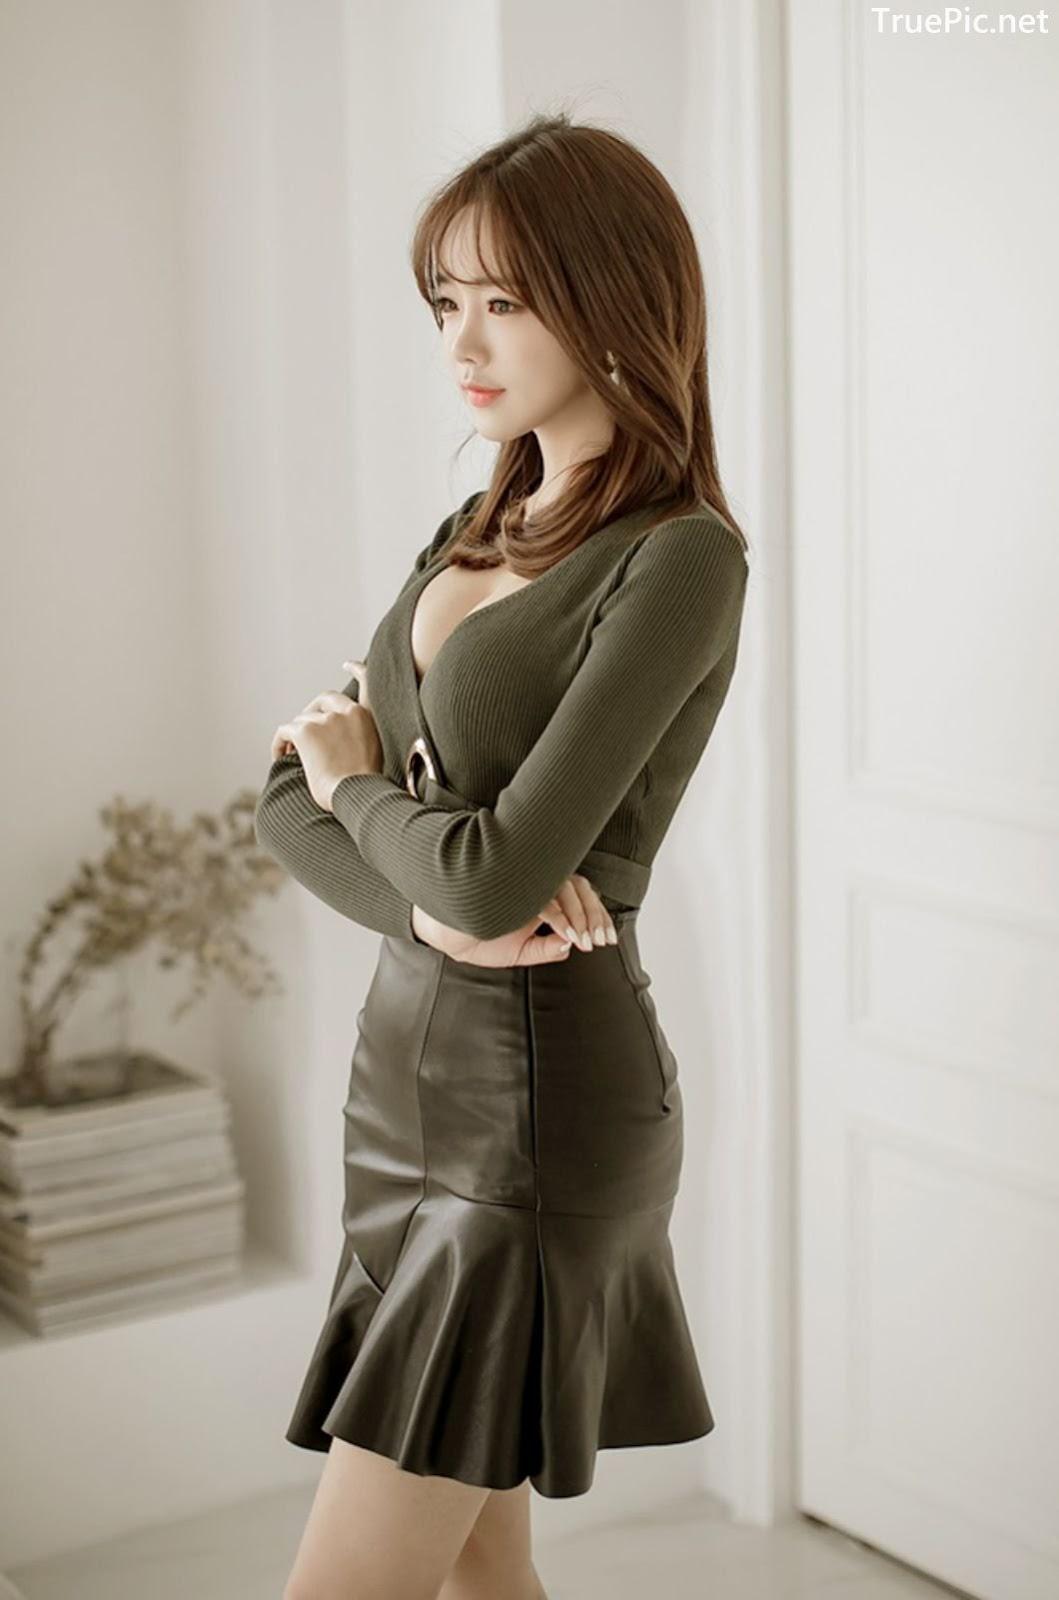 Image-Korean-Fashion-Model–Kang-Eun-Wook–Indoor-Photoshoot-Collection-2-TruePic.net- Picture-5